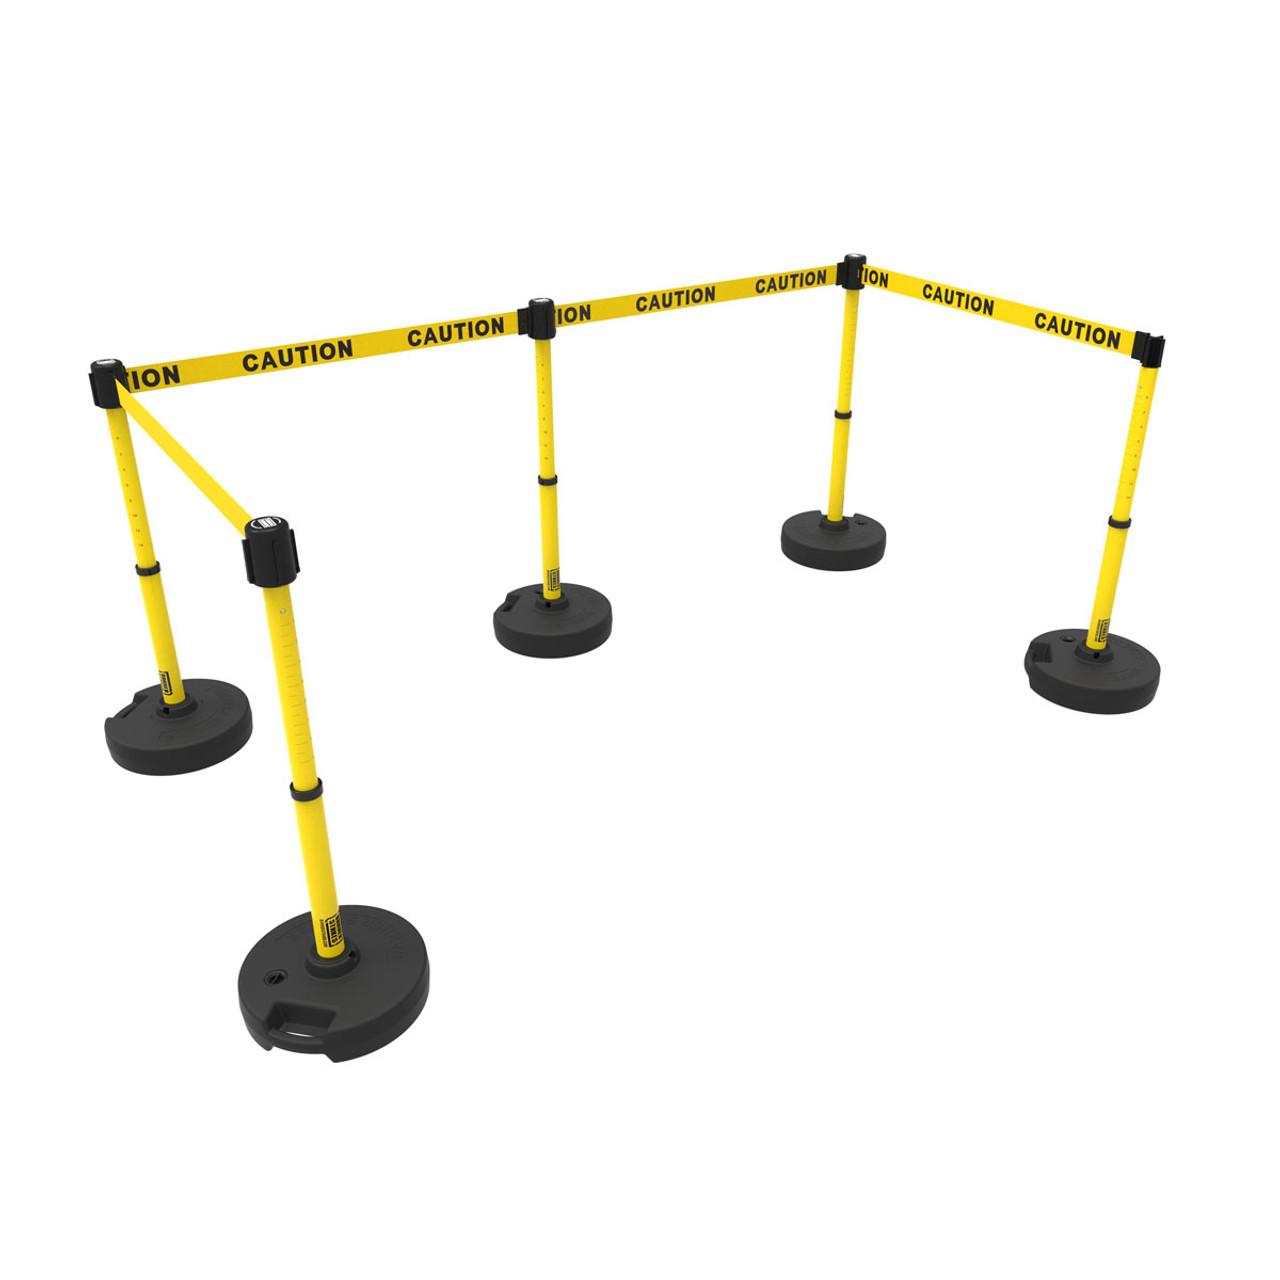 retractable safety barrier set: 5 stanchions, 60' caution tape